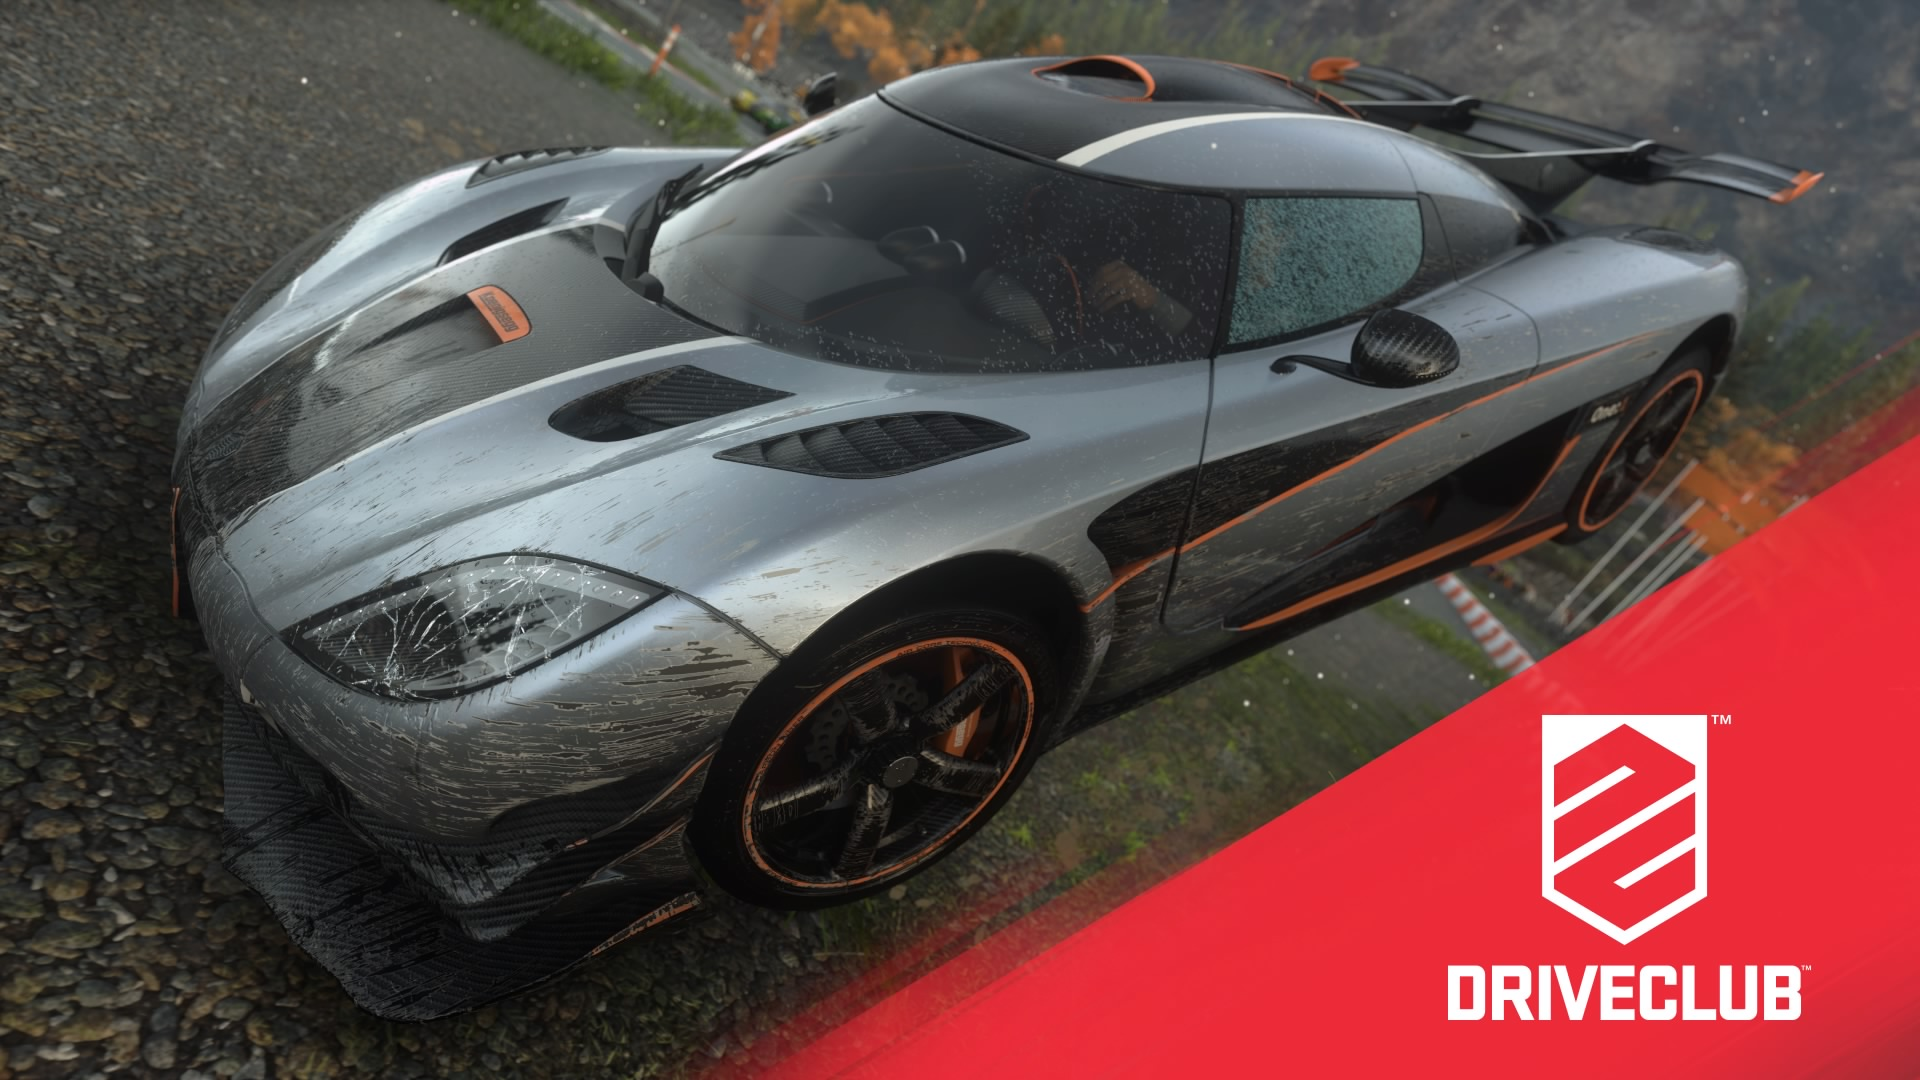 Driveclub-VR-gamersrd.com